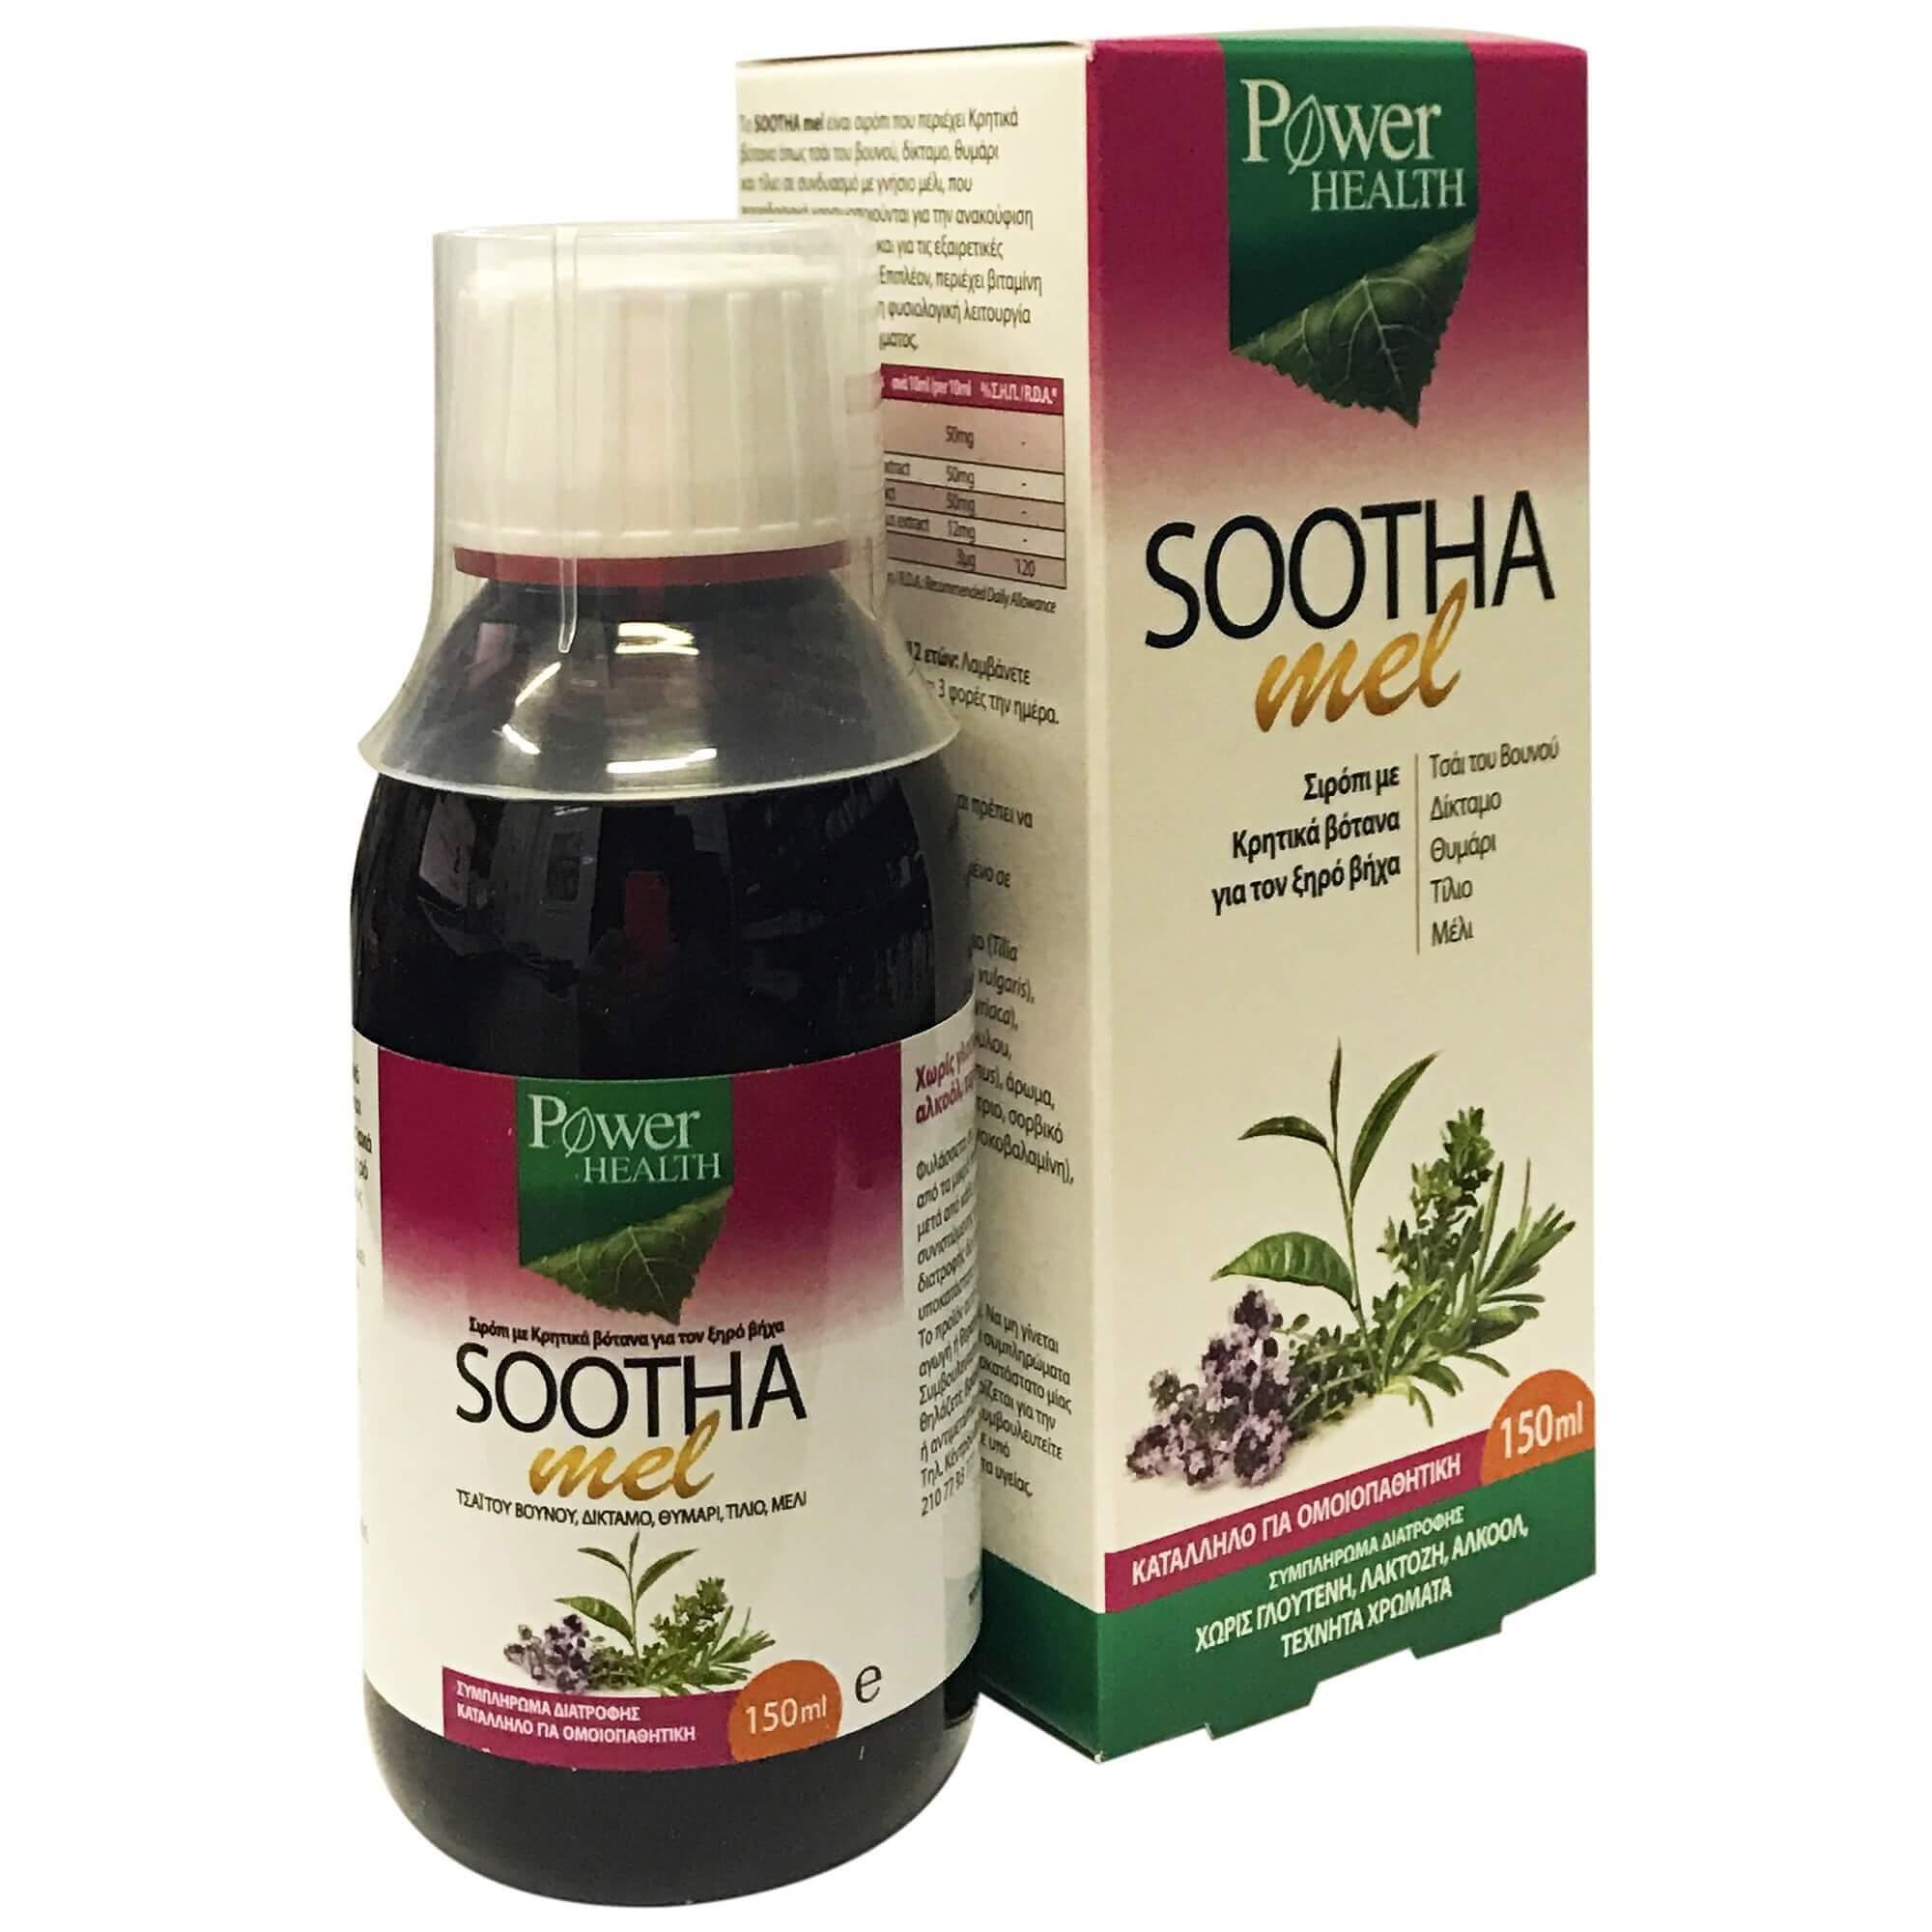 Power Health Soothamel Σιρόπι με Κρητικά Βότανα για τον Ξηρό Βήχα150ml